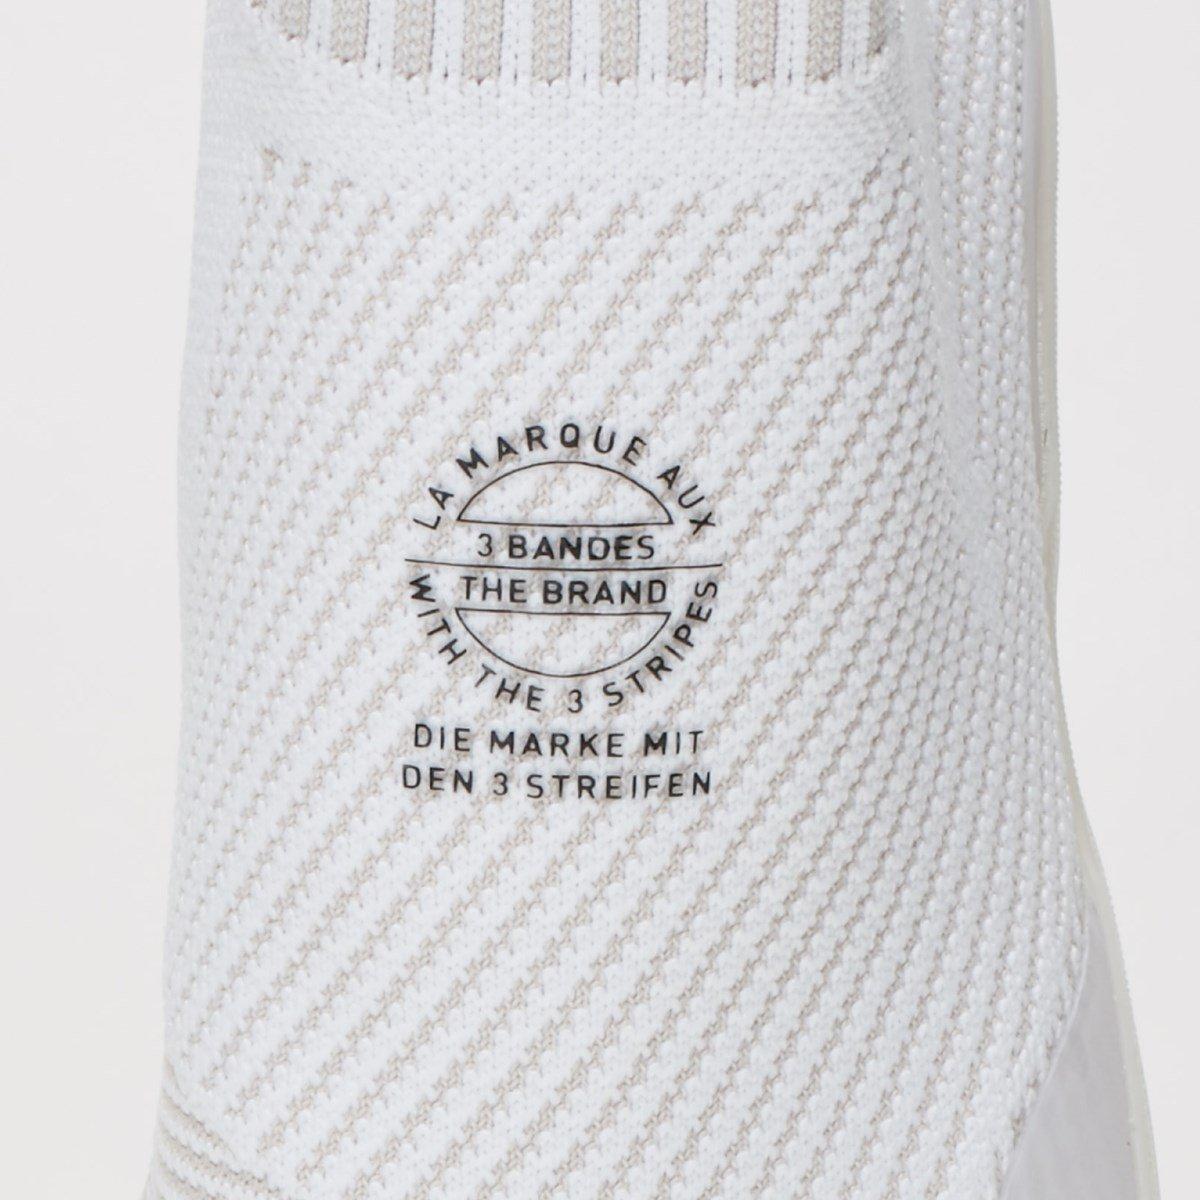 reputable site 3c459 8b1a1 adidas 3ST.002 PK - Cg5613 - Sneakersnstuff  sneakers  streetwear online  since 1999